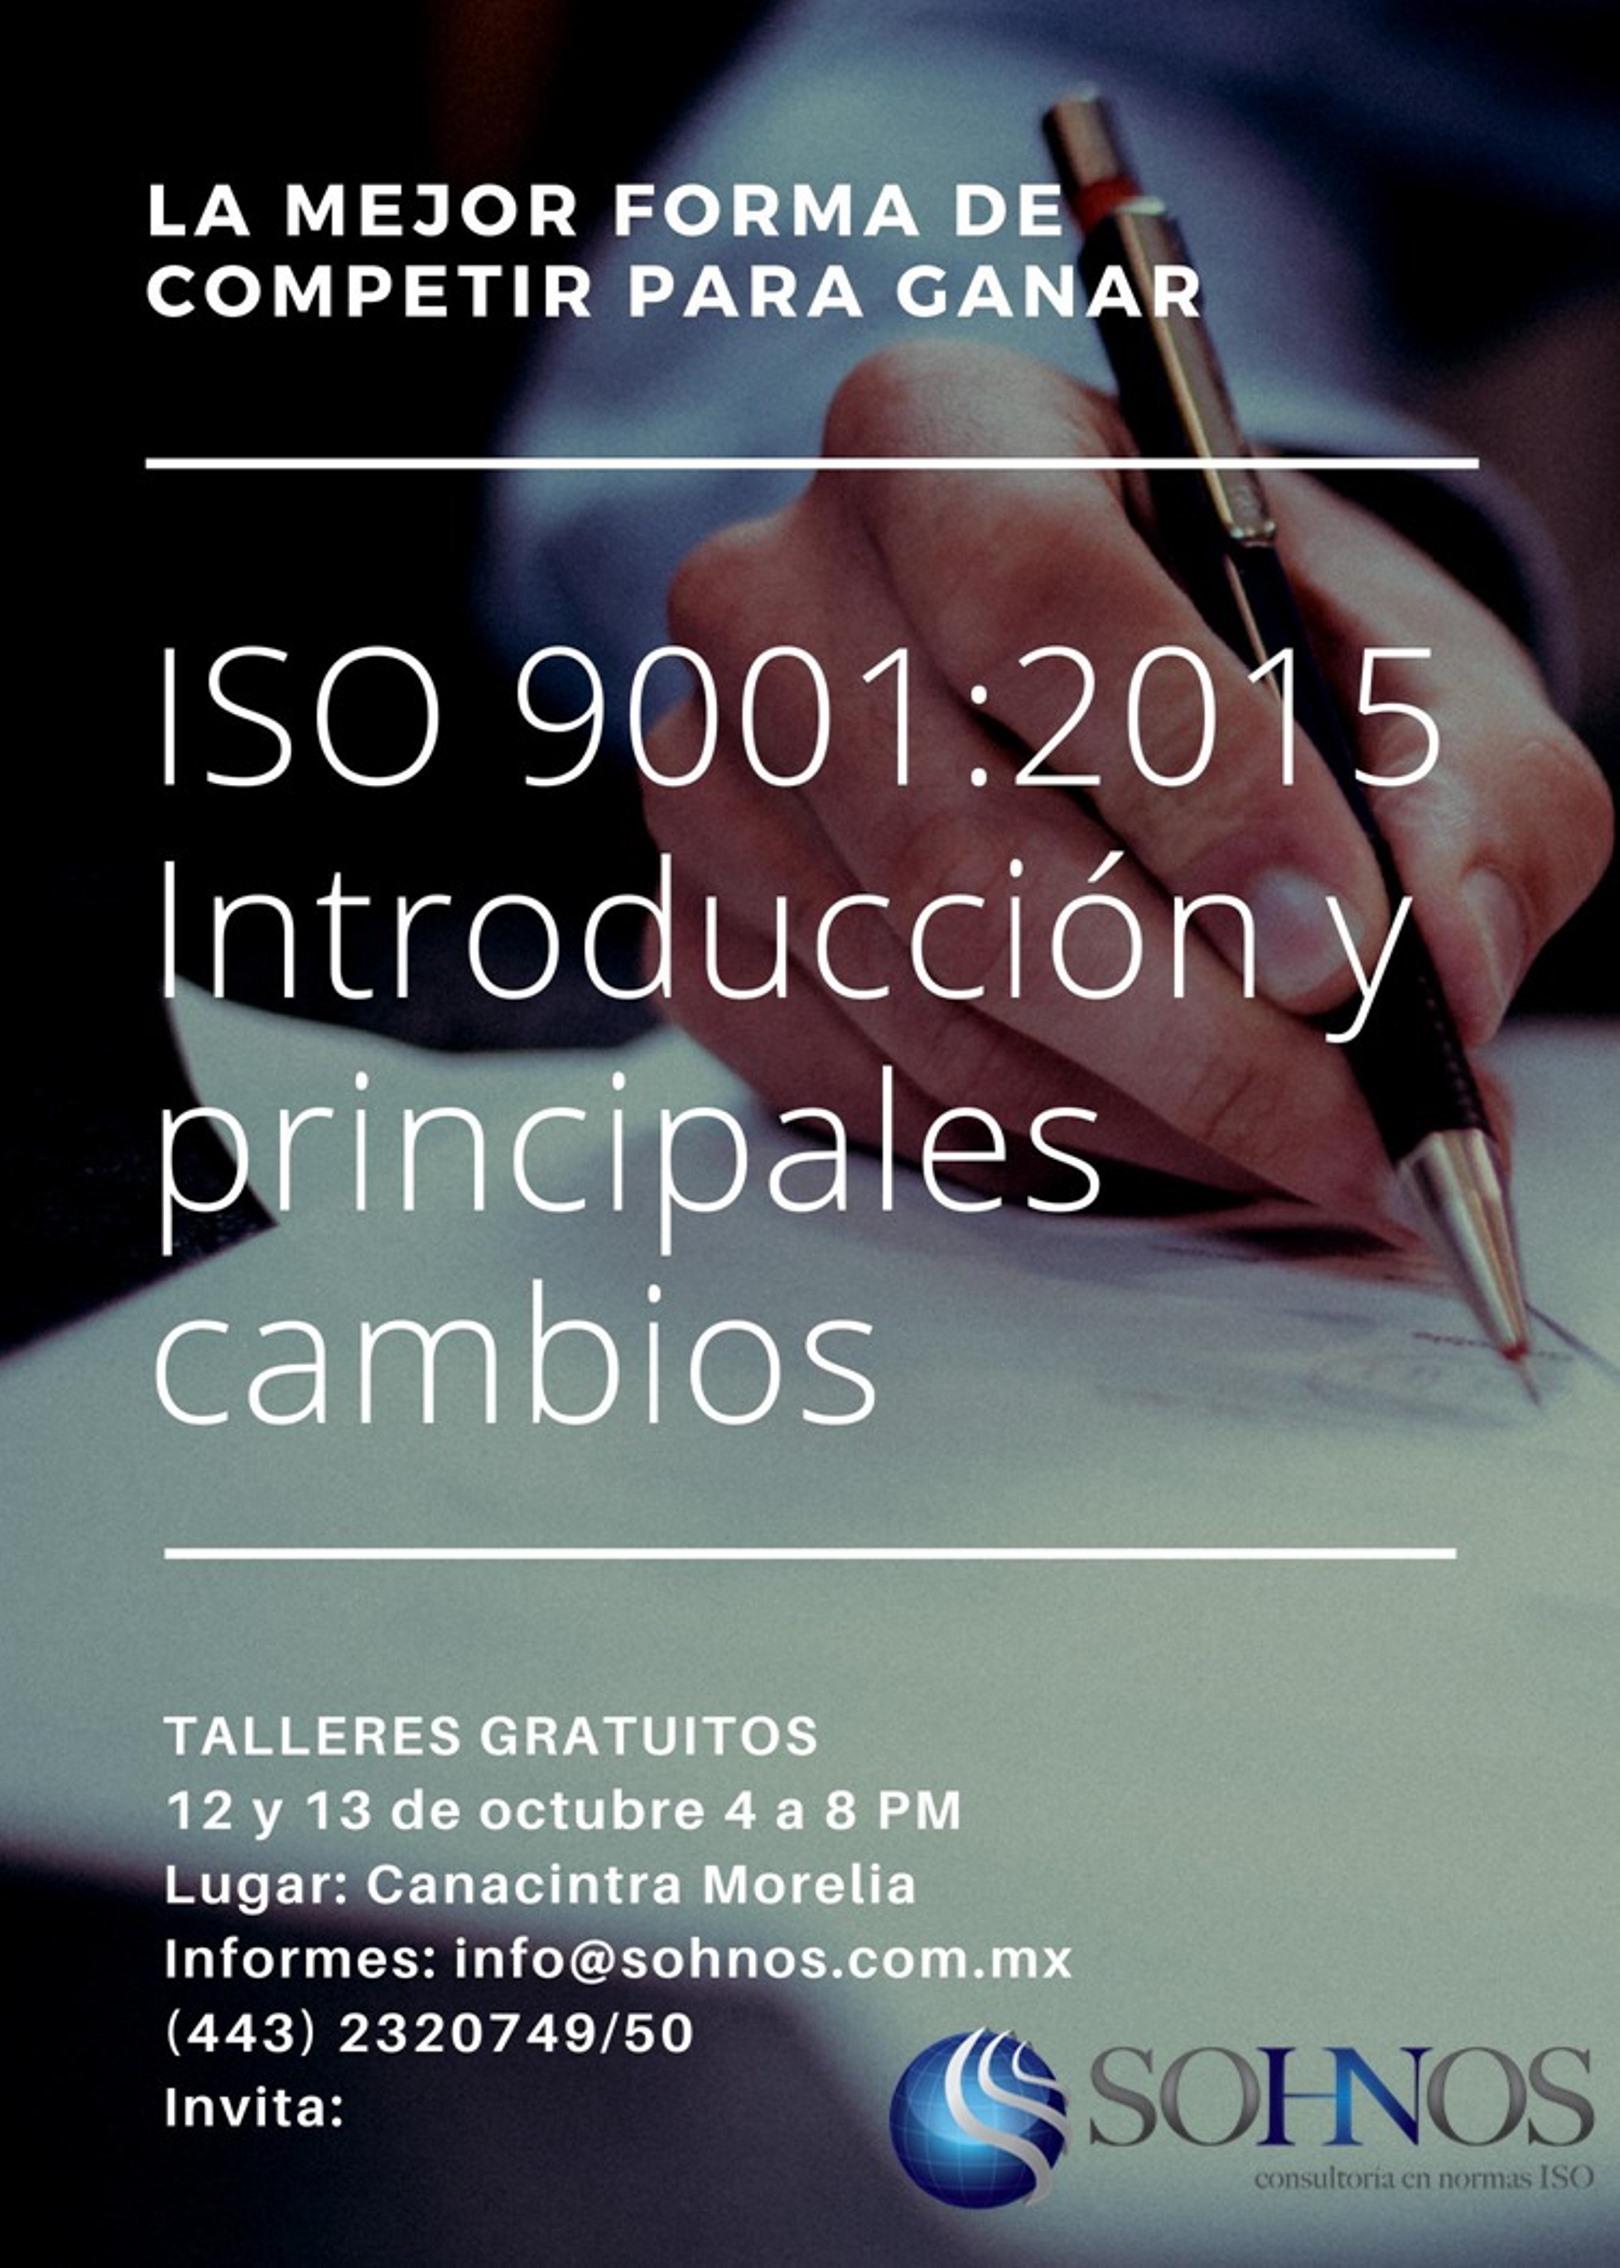 Capacitación en ISO 9001:2015